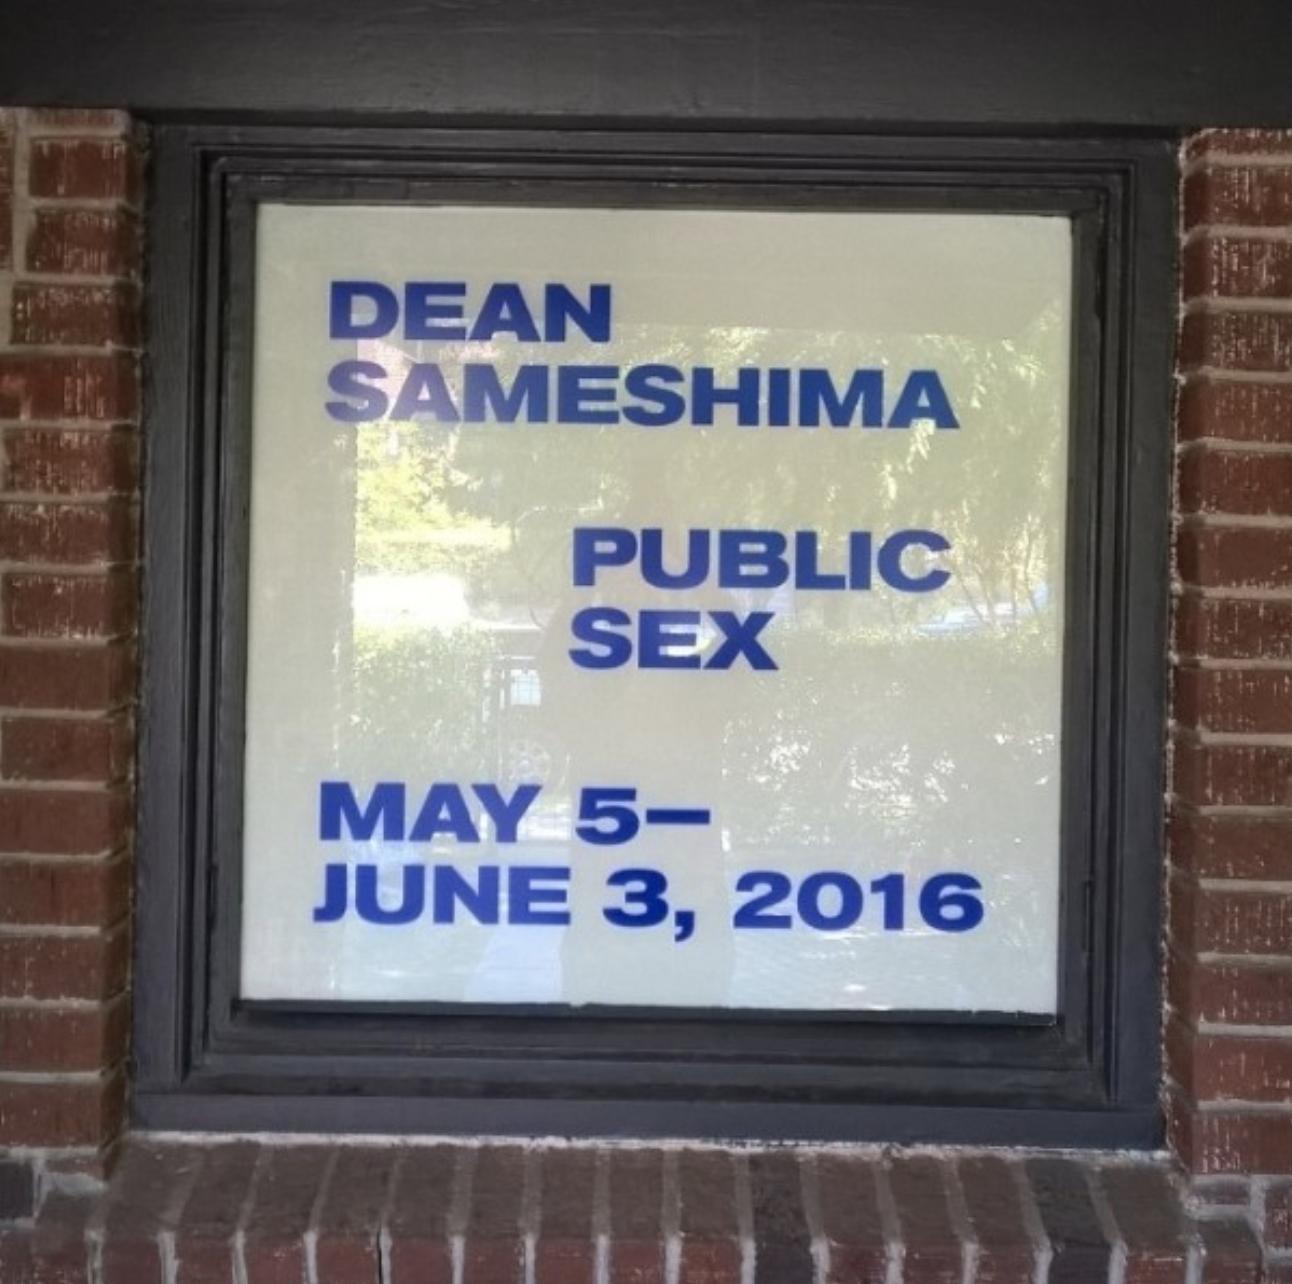 Dean Sameshima: Public Sex